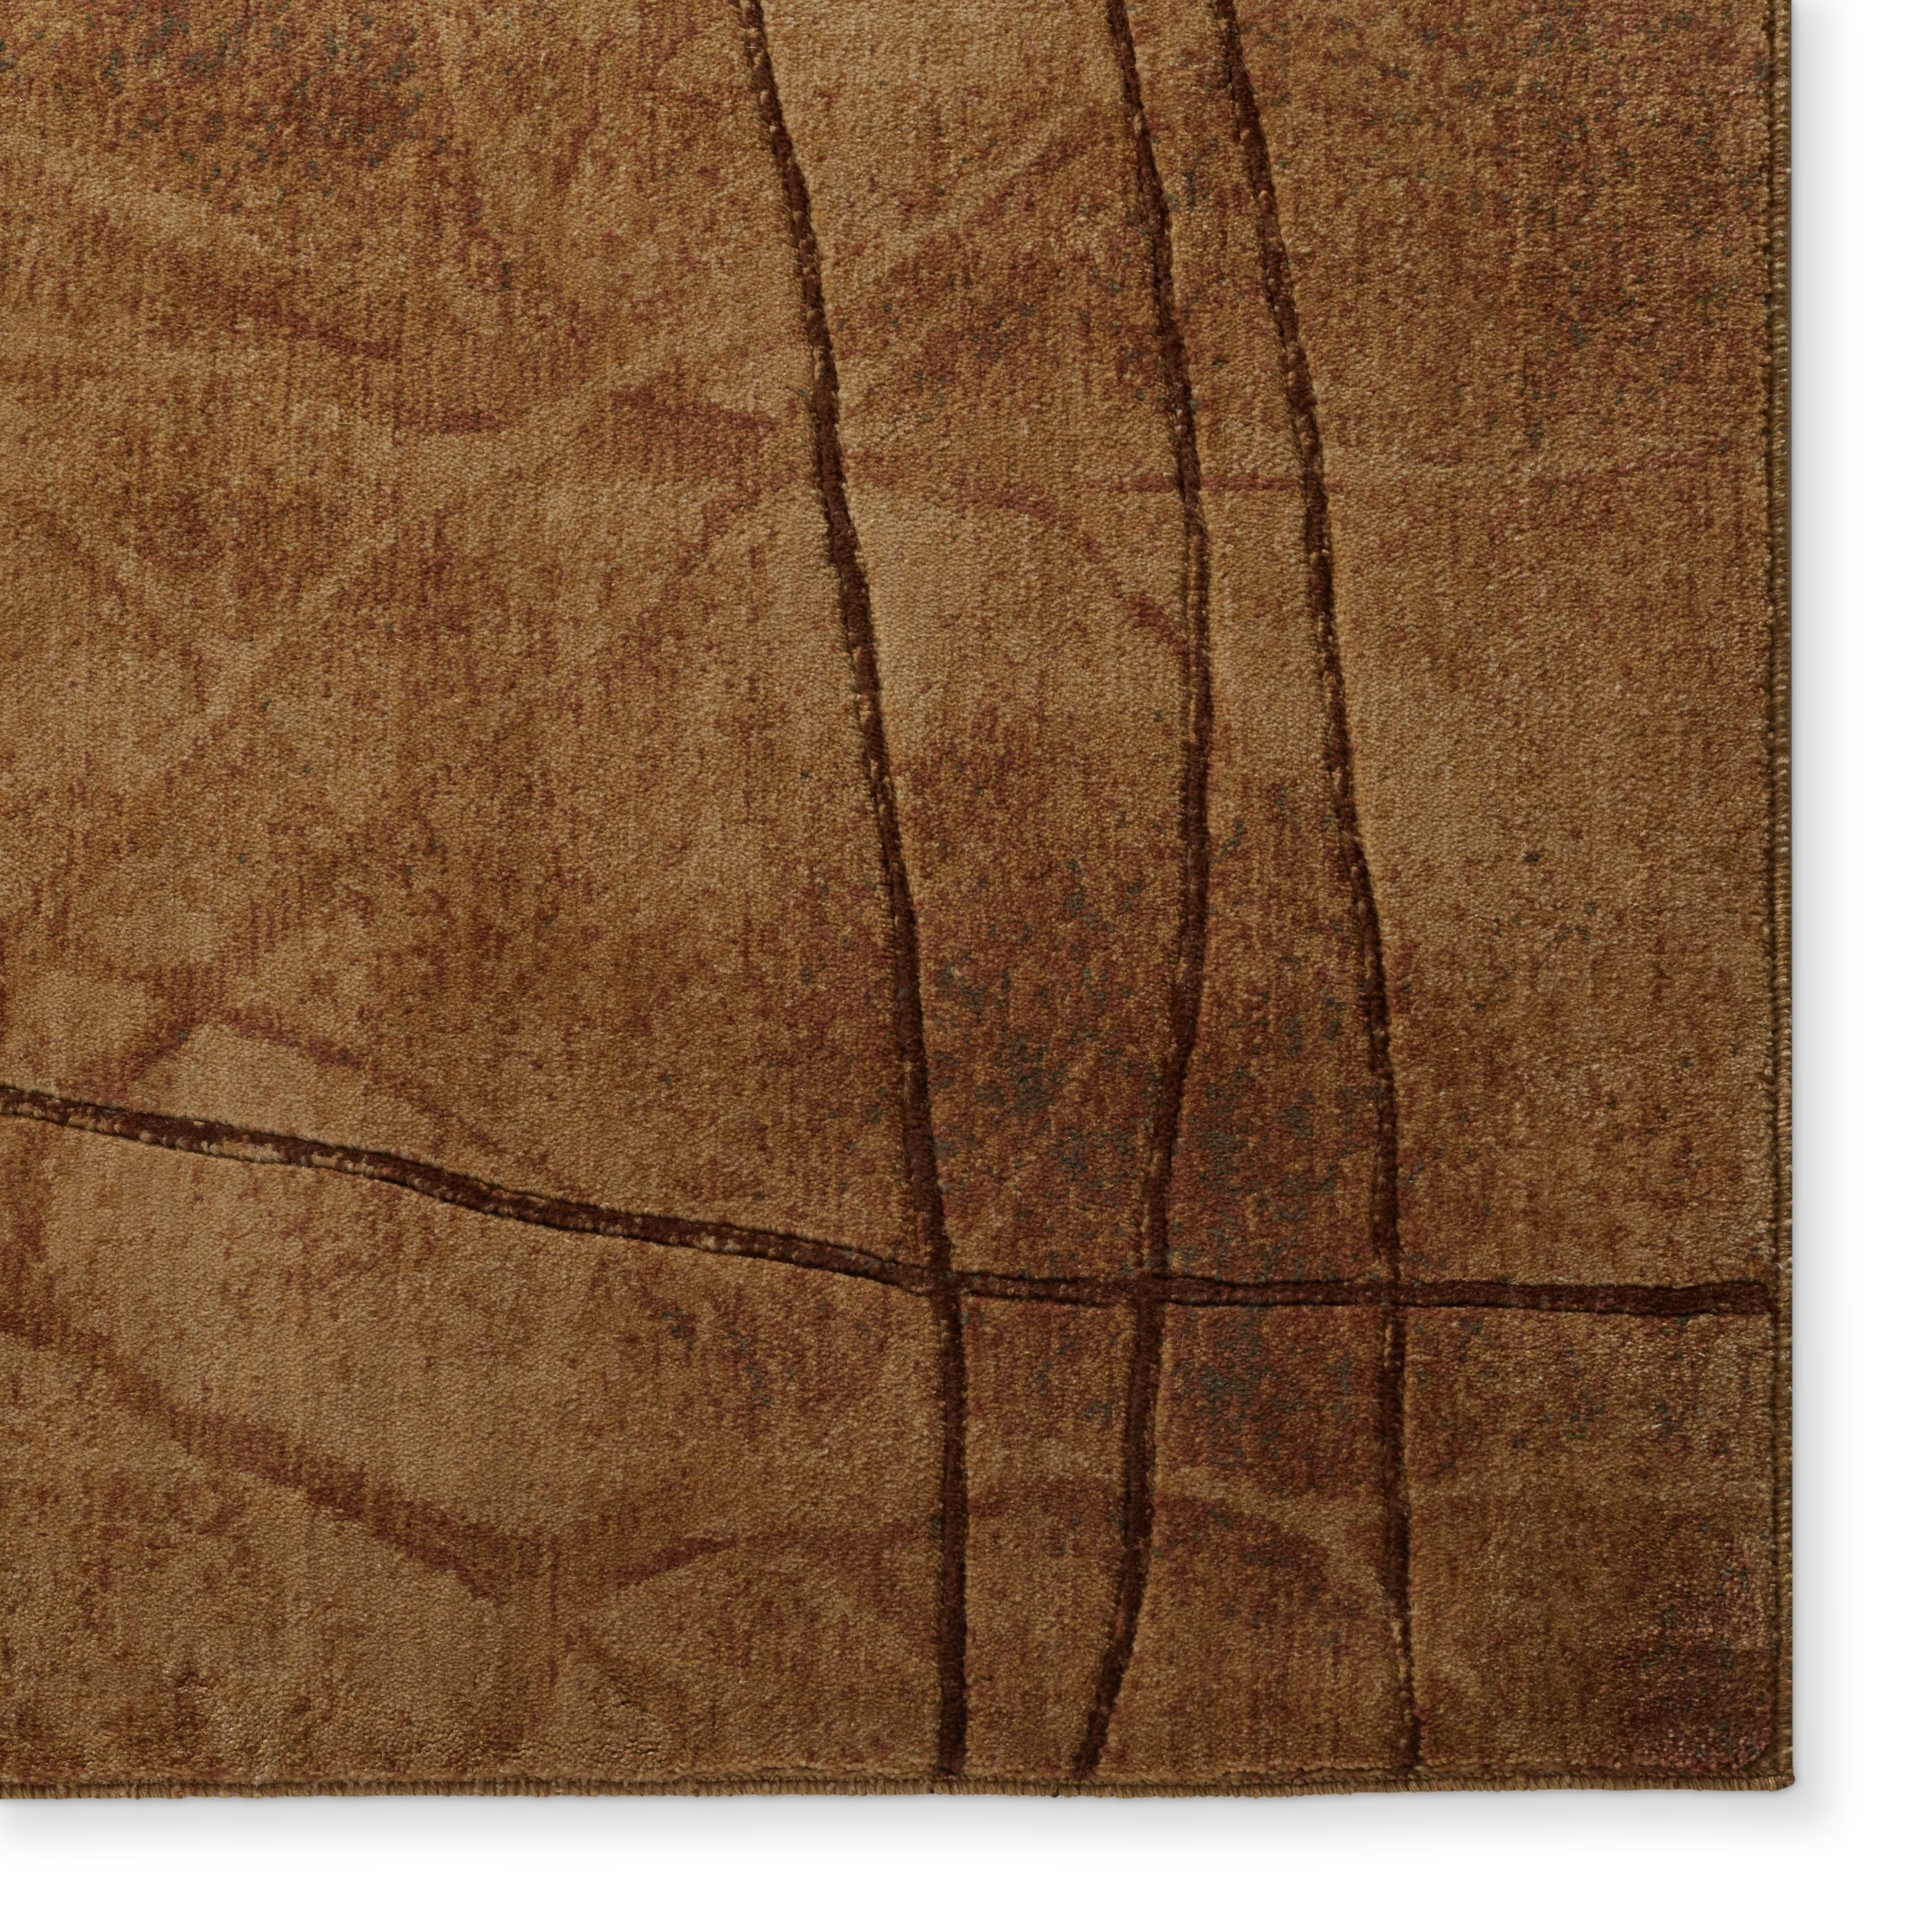 Nourison Somerset Latte Area Rug (5'3 x 7'5)